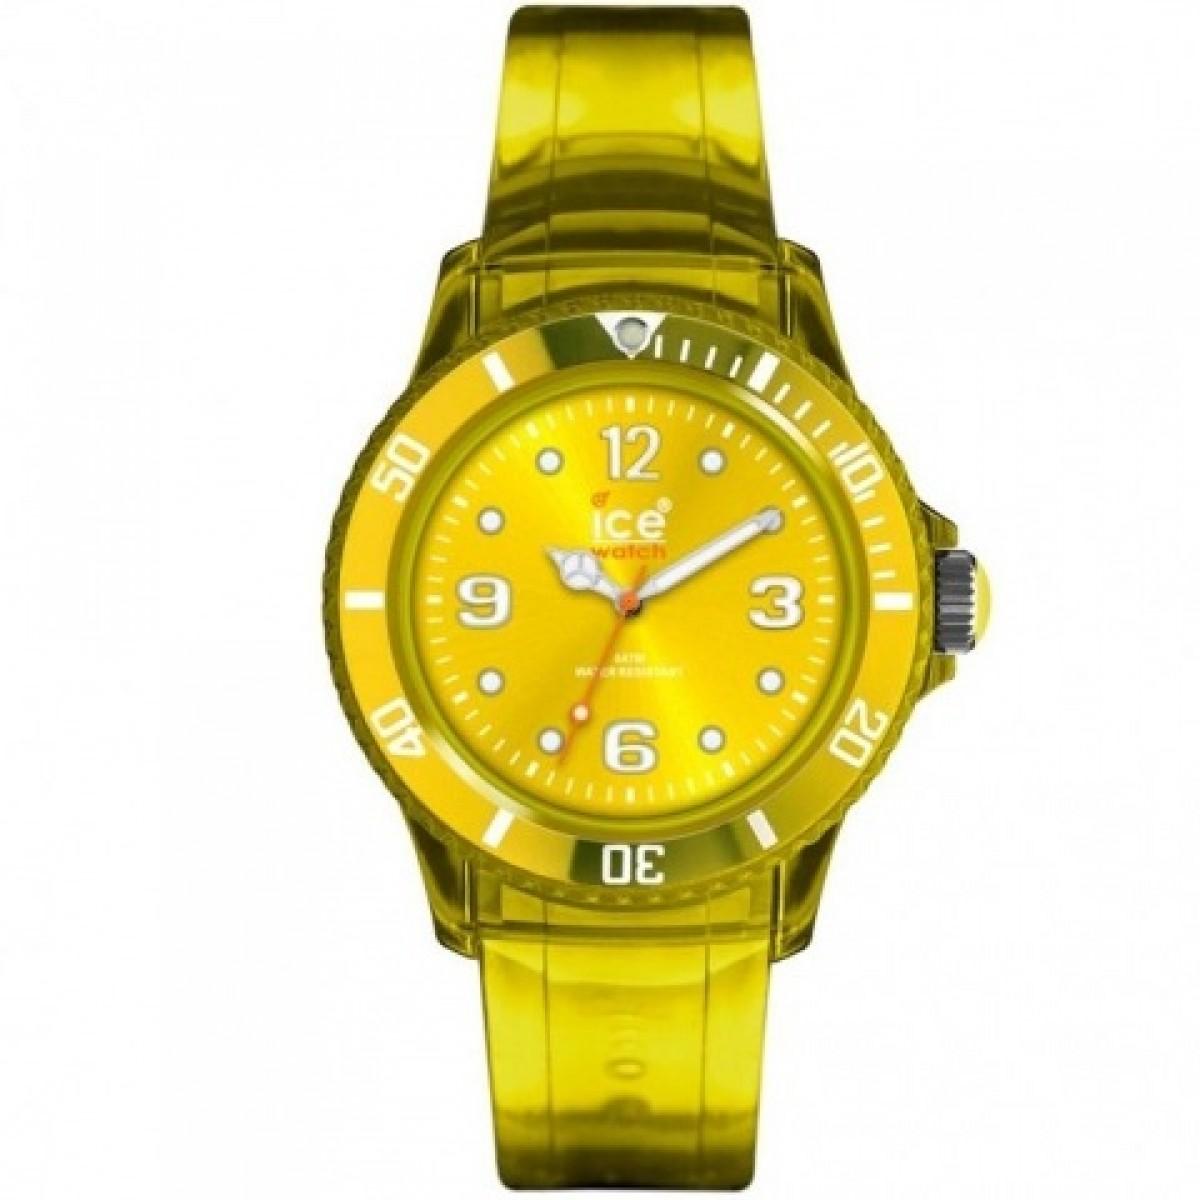 Часовник Ice-Watch JY.YT.U.U.10 Unisex